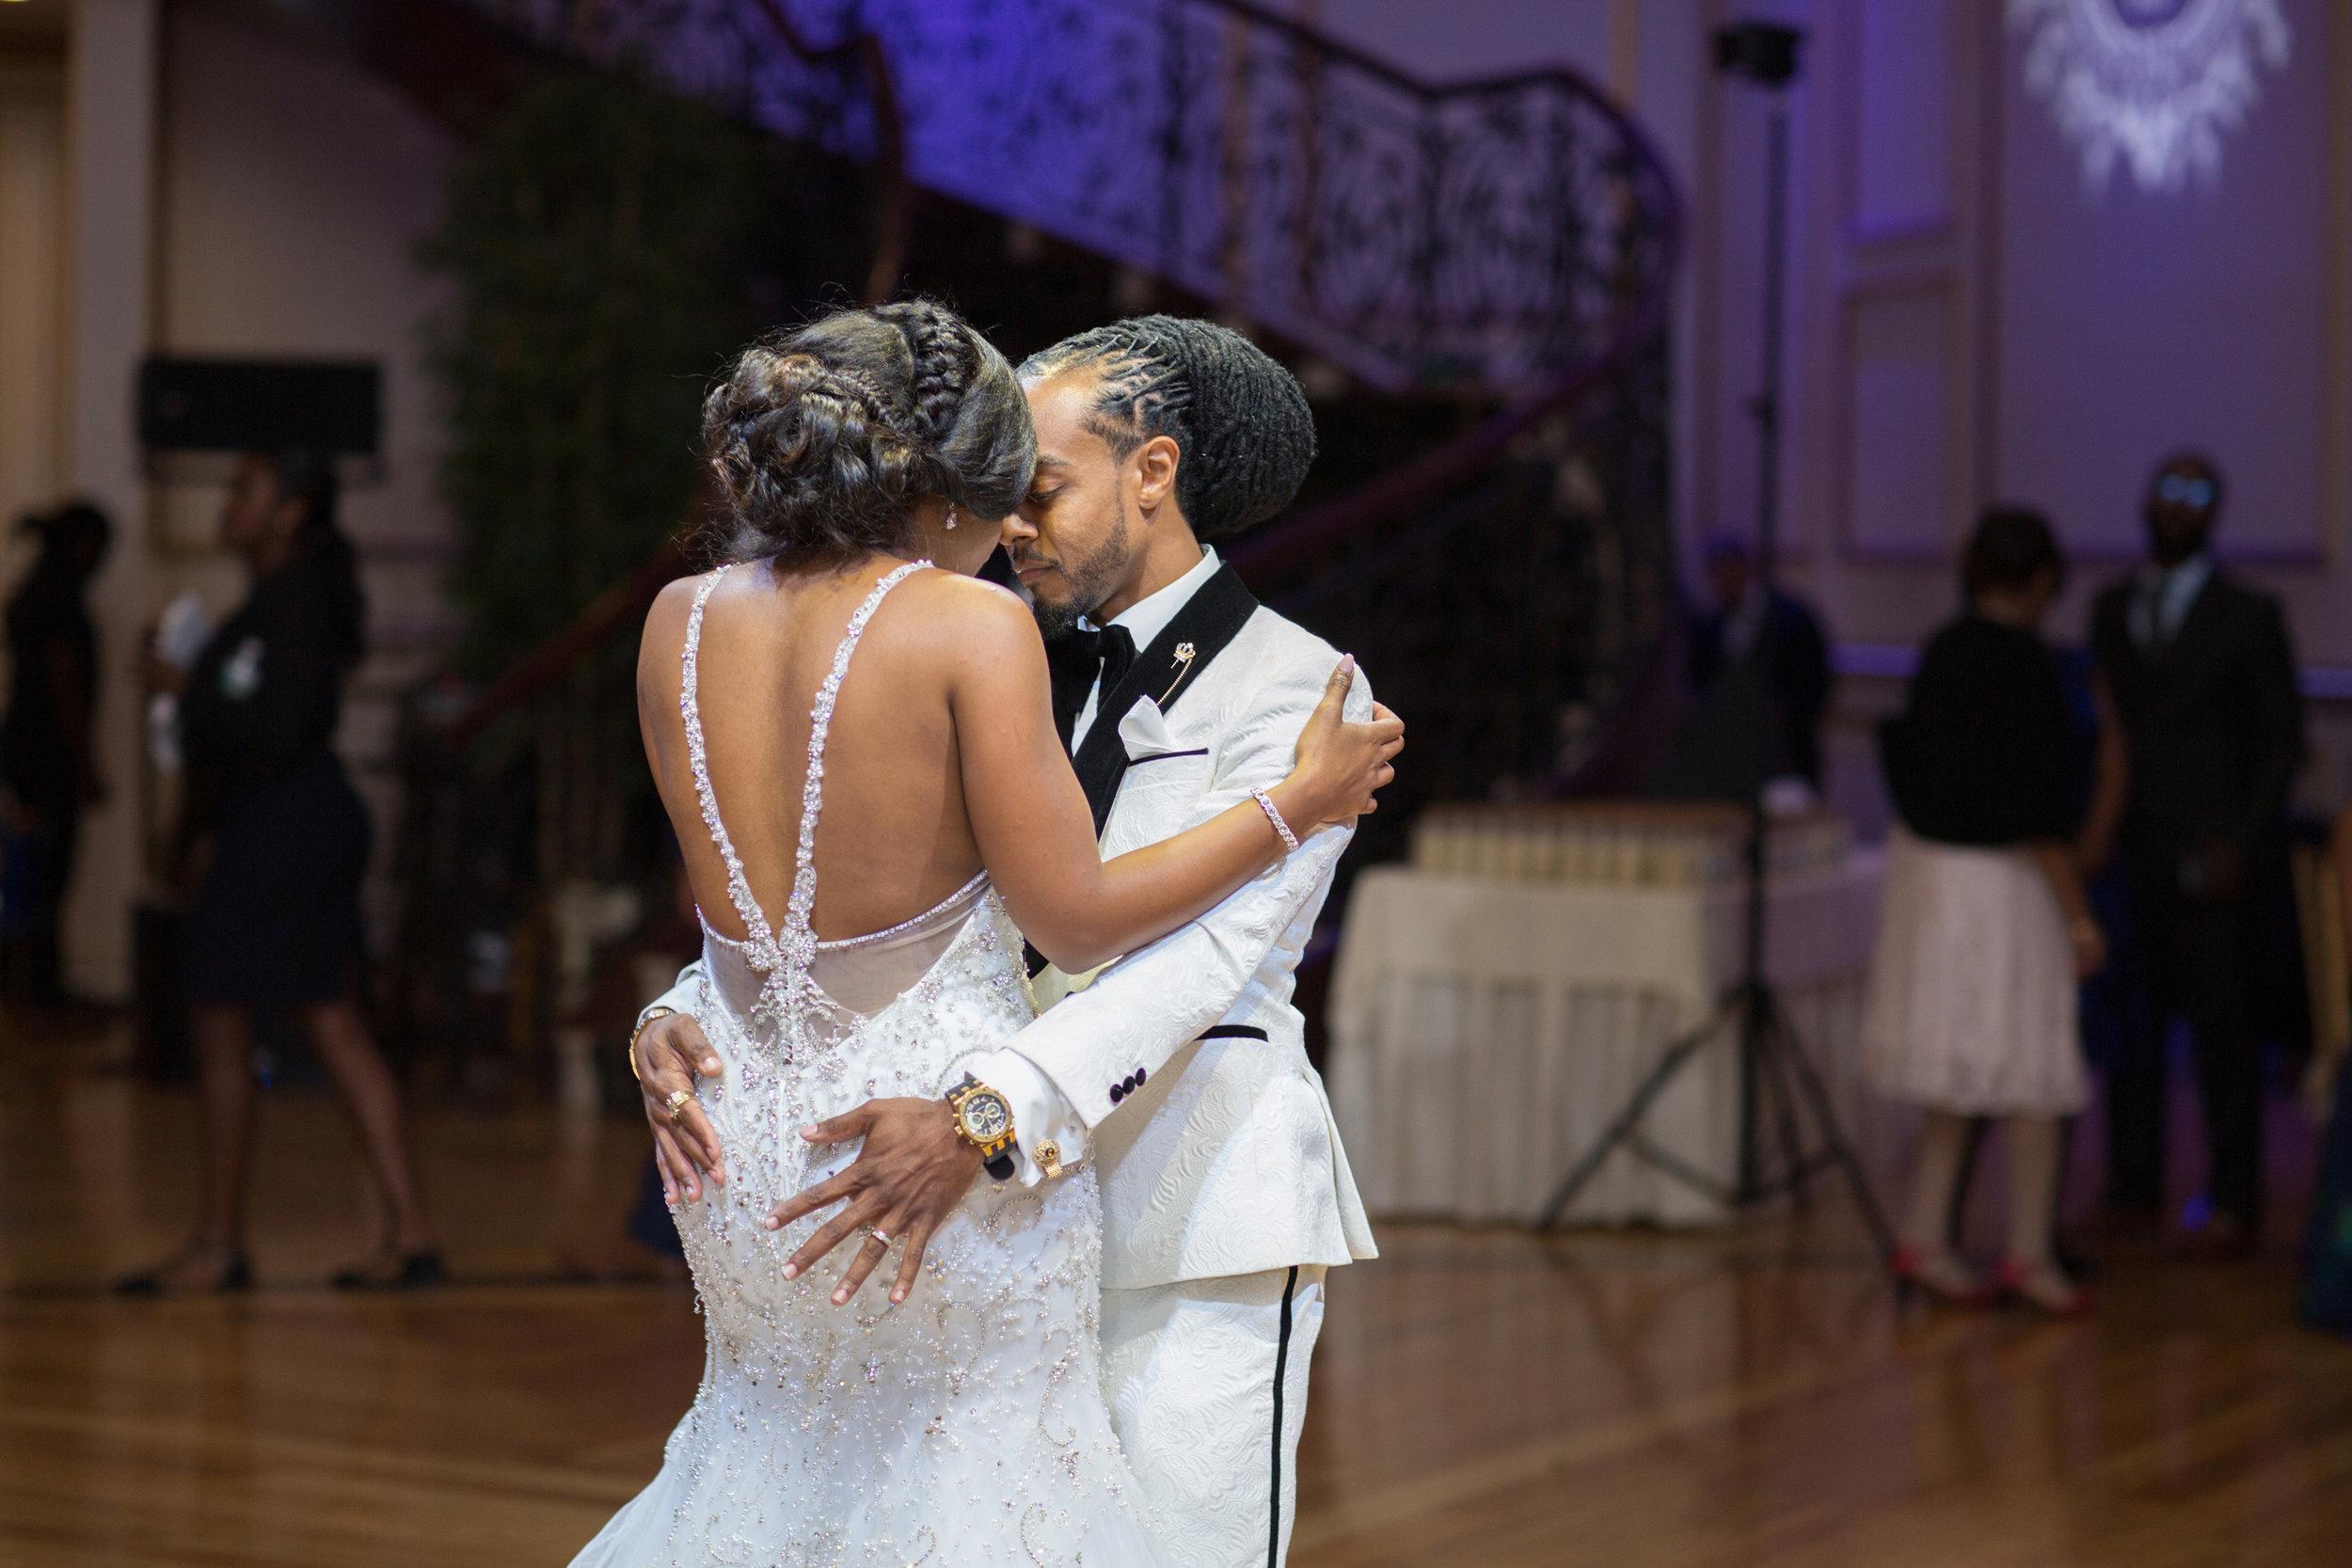 victorious-events-nyc-028-romie-kamali-tides-estate-wedding-nana-annan.jpg